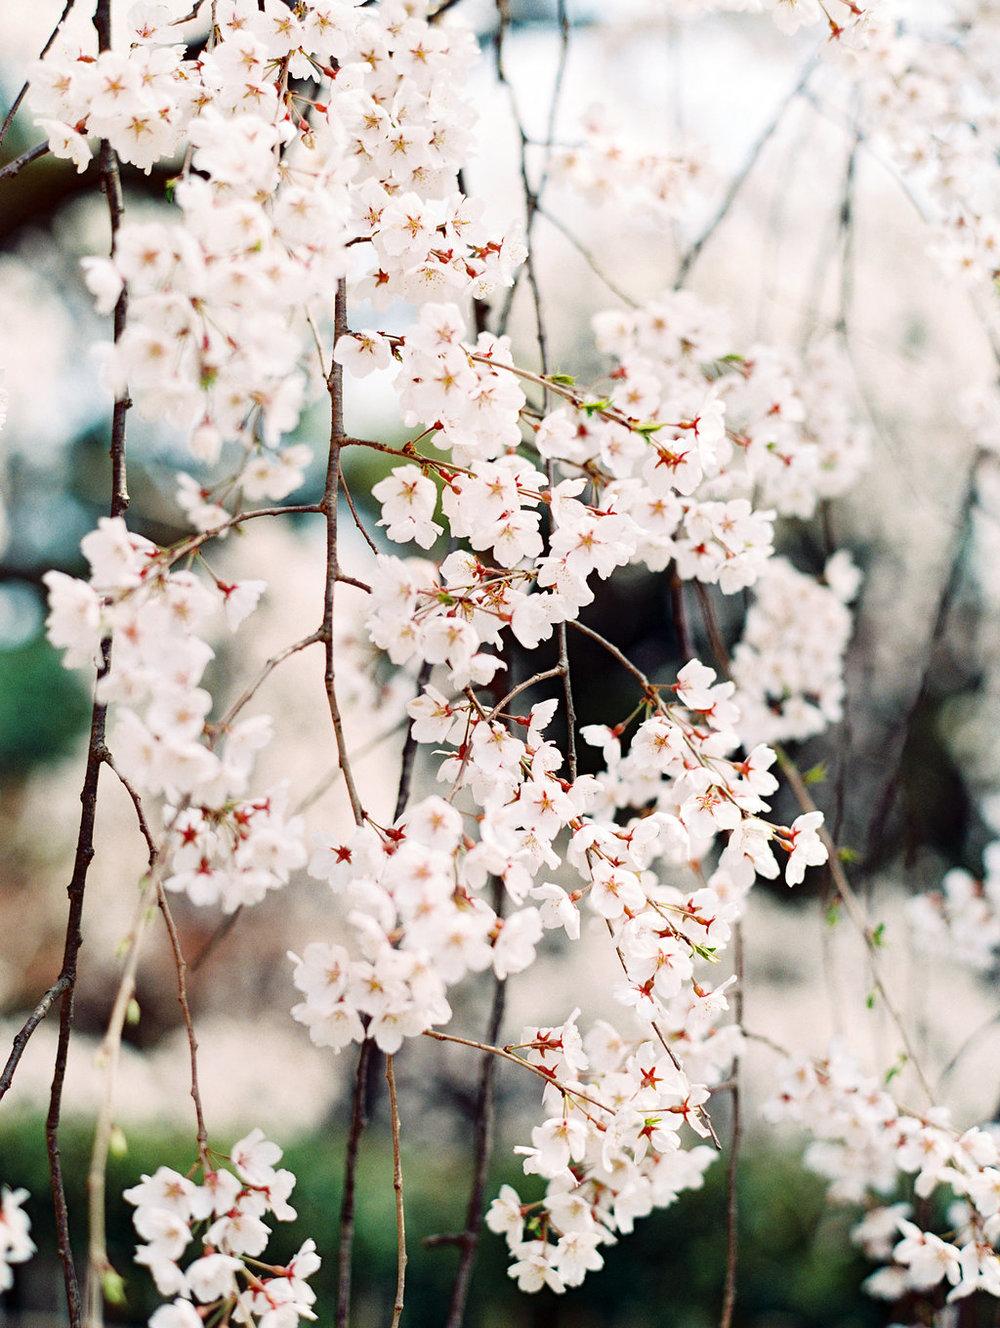 StephanieGanPhotoJapan-148.jpg